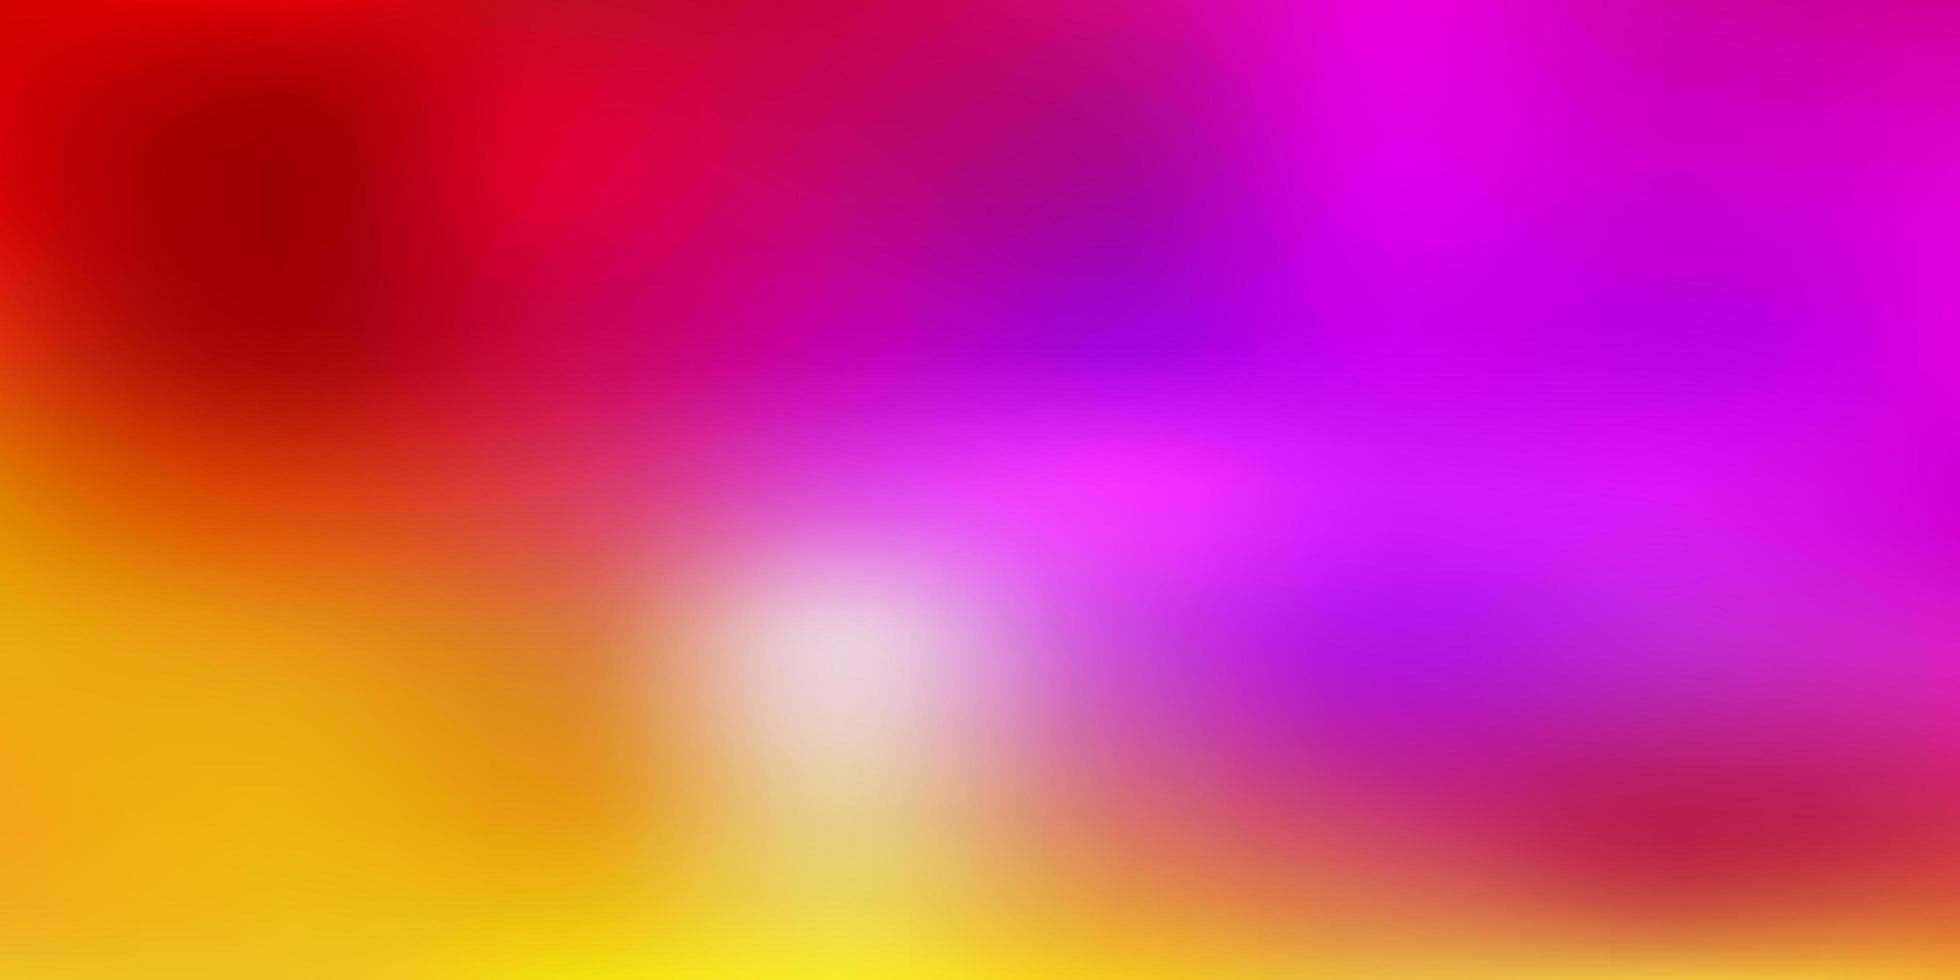 ljus flerfärgad vektor suddig konsistens.